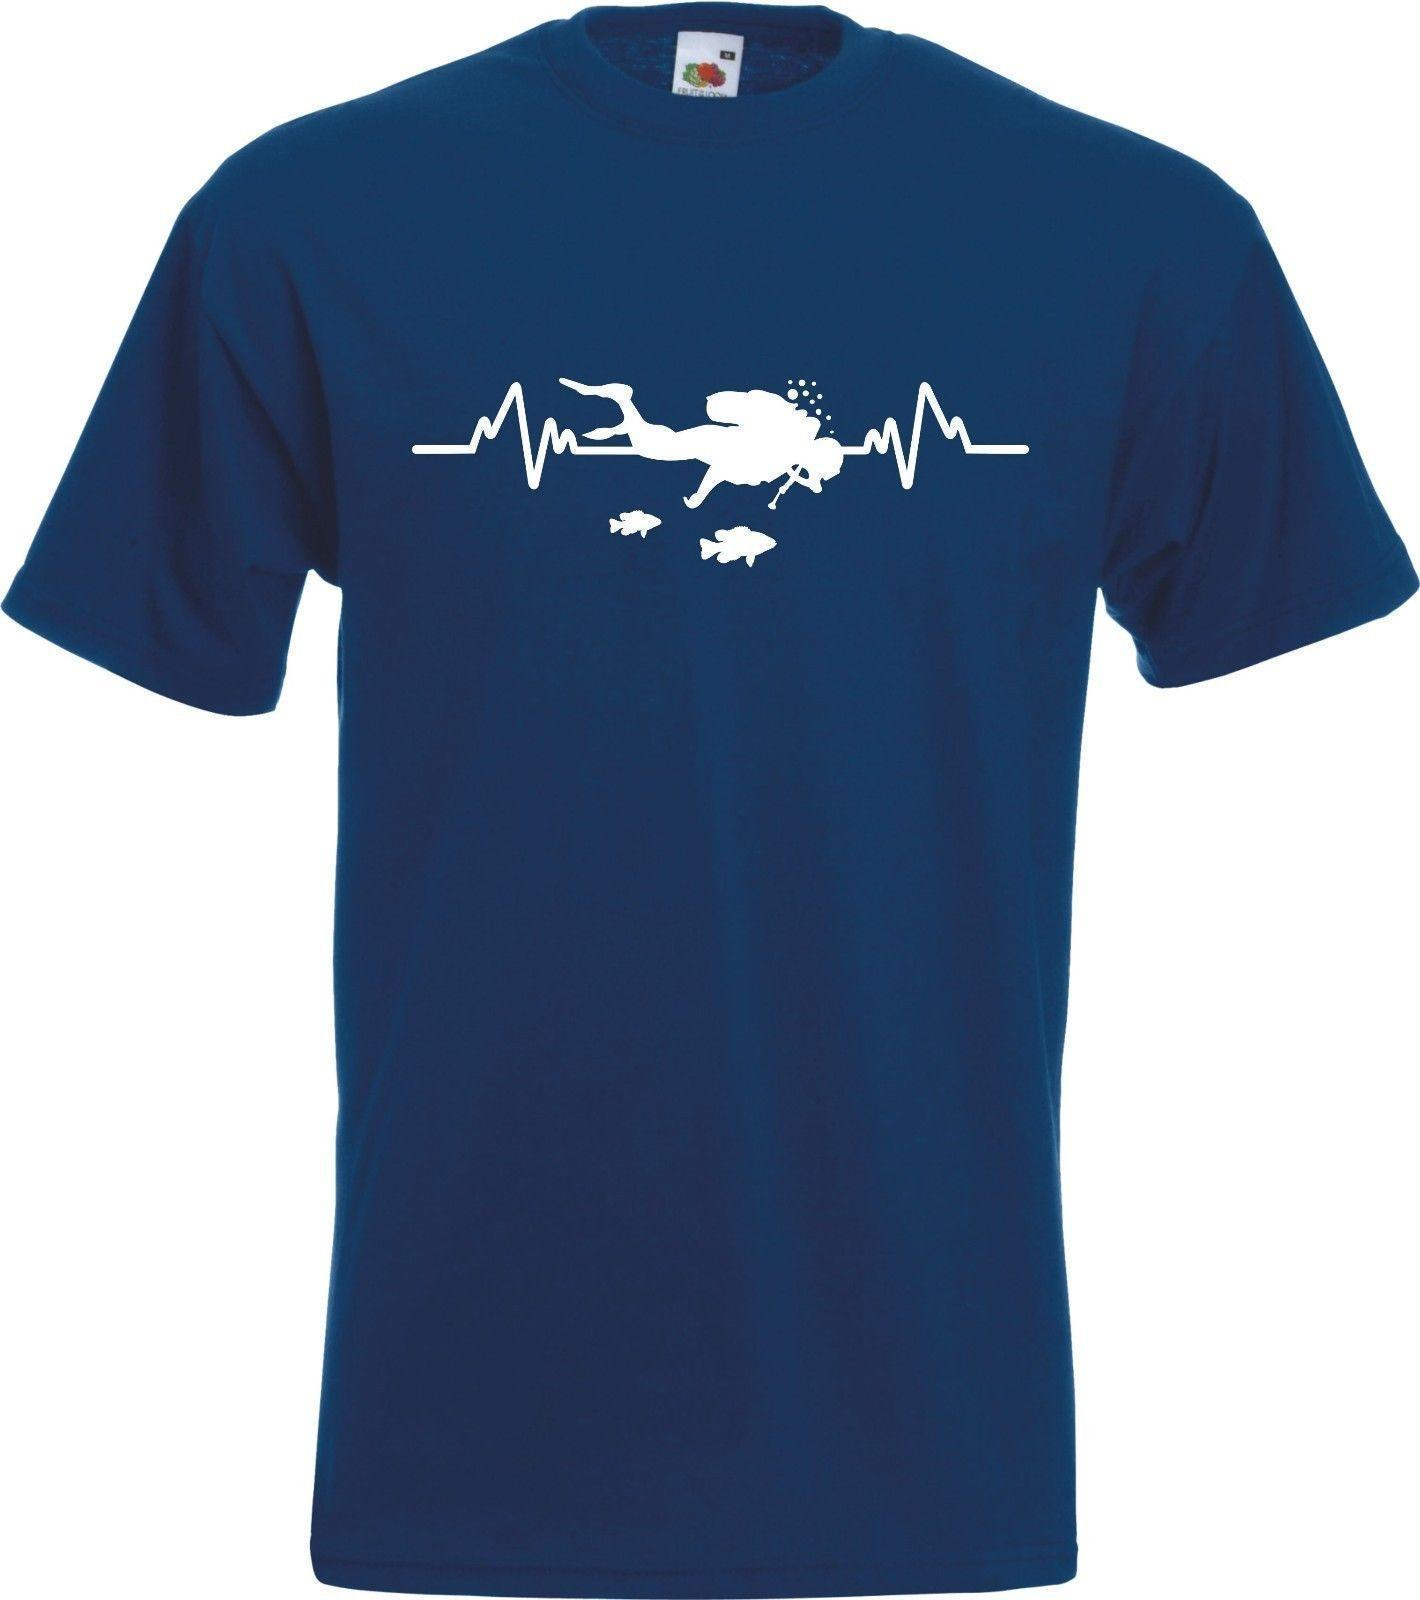 2de88e8f68 Scuba Diving Heartbeat Diver T Shirt Funny Unisex Casual Gift Tee Shirt  Designers Funny Print T Shirts From Lukehappy13, $12.96  DHgate.Com